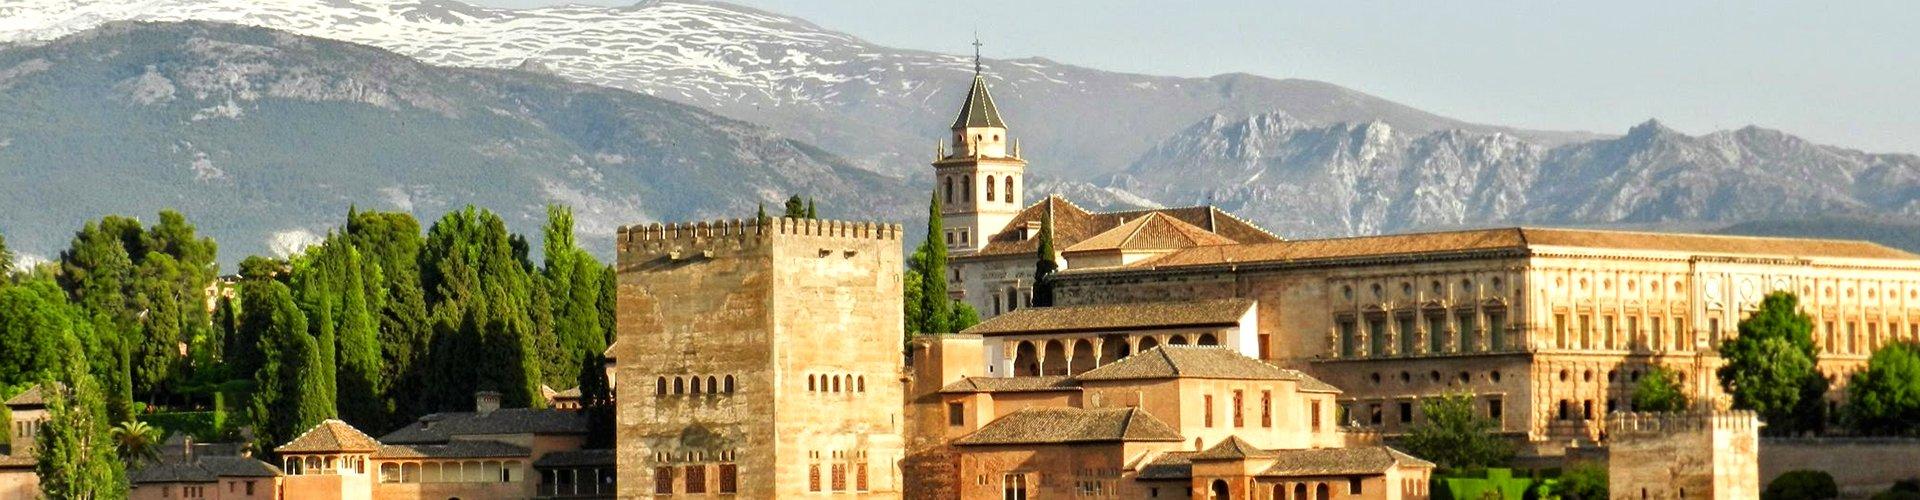 Alhambra, Spanje